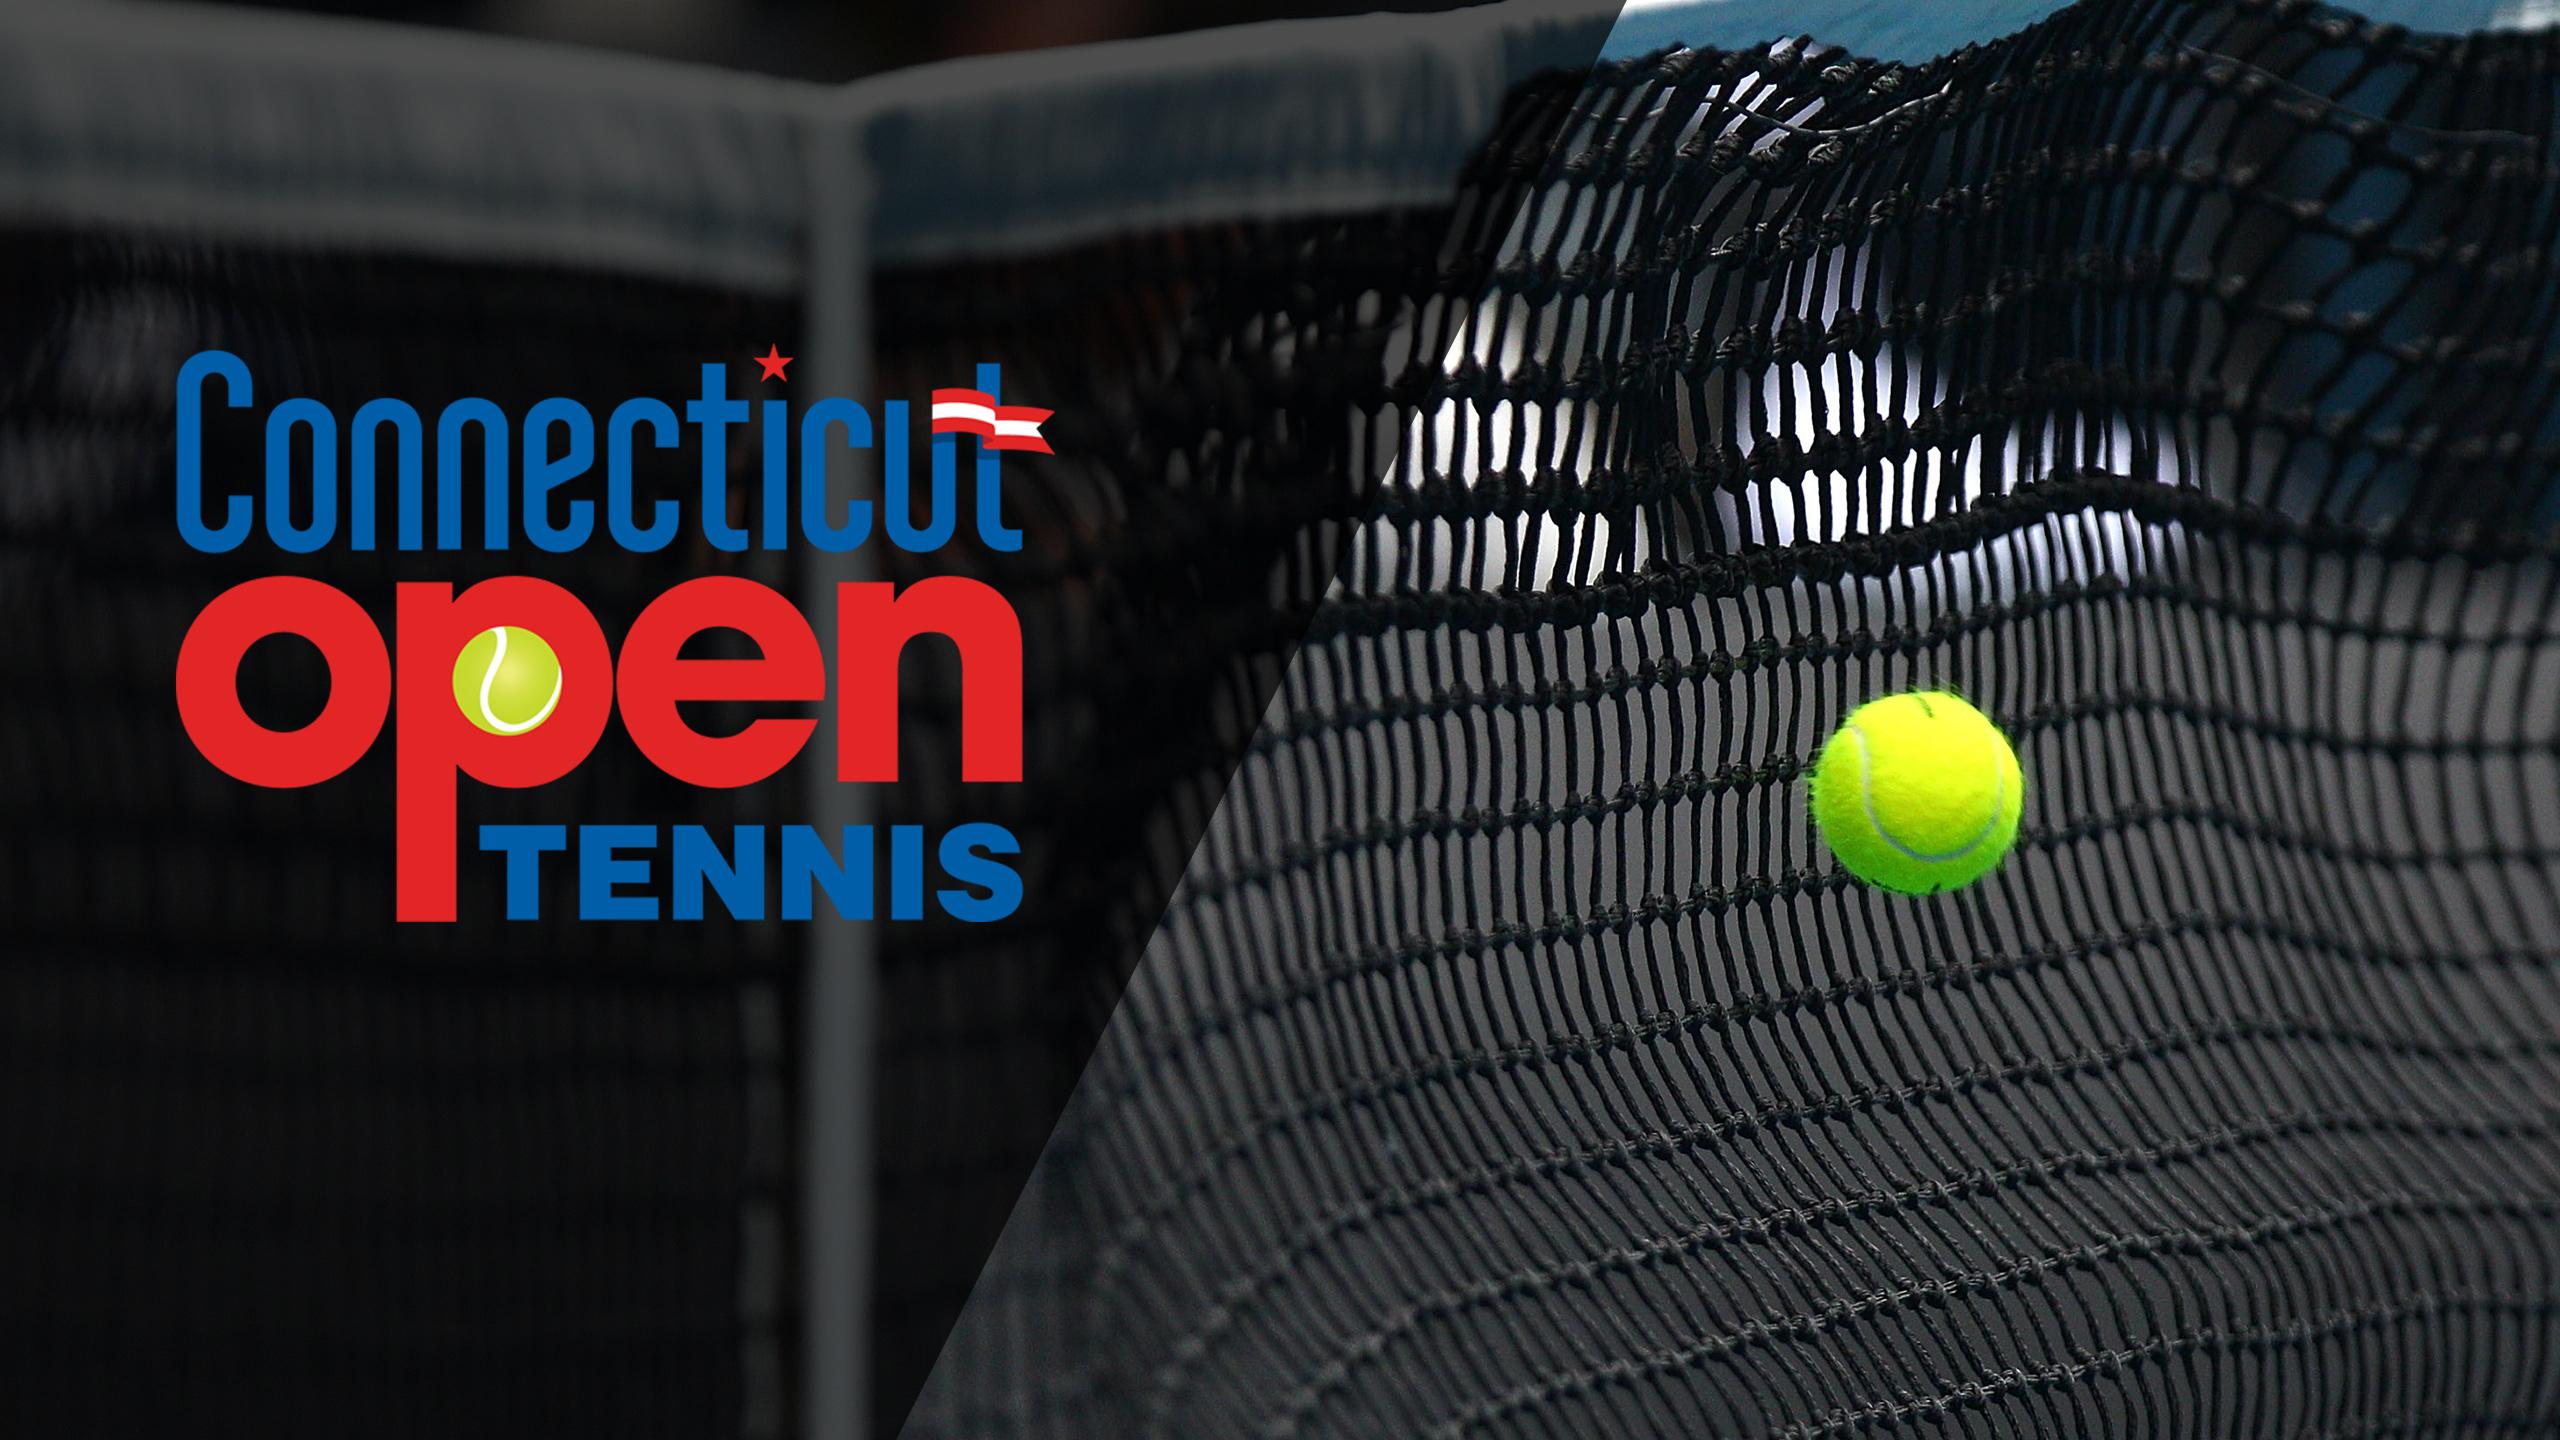 2018 US Open Series - Connecticut Open (Semifinal #1)